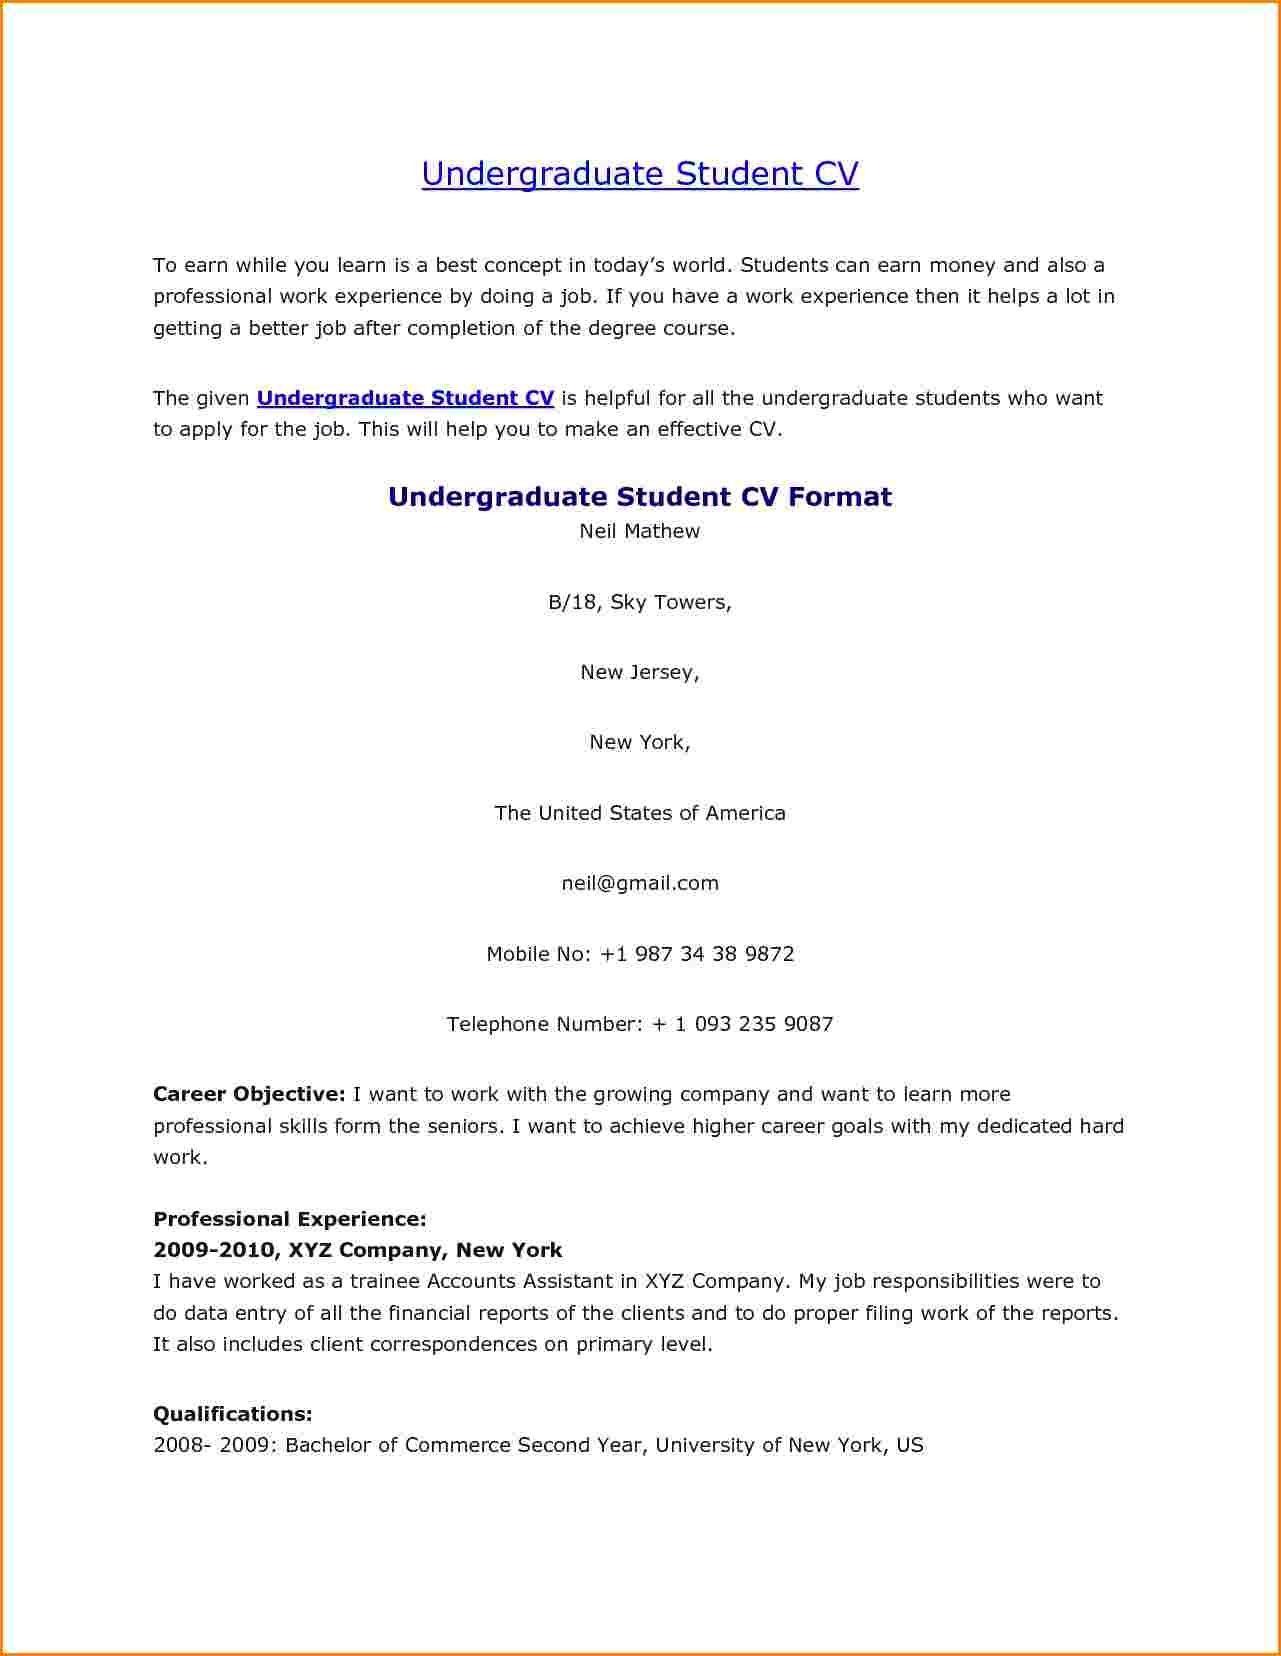 Undergraduate | Resume Templates | Pinterest | Student resume and ...